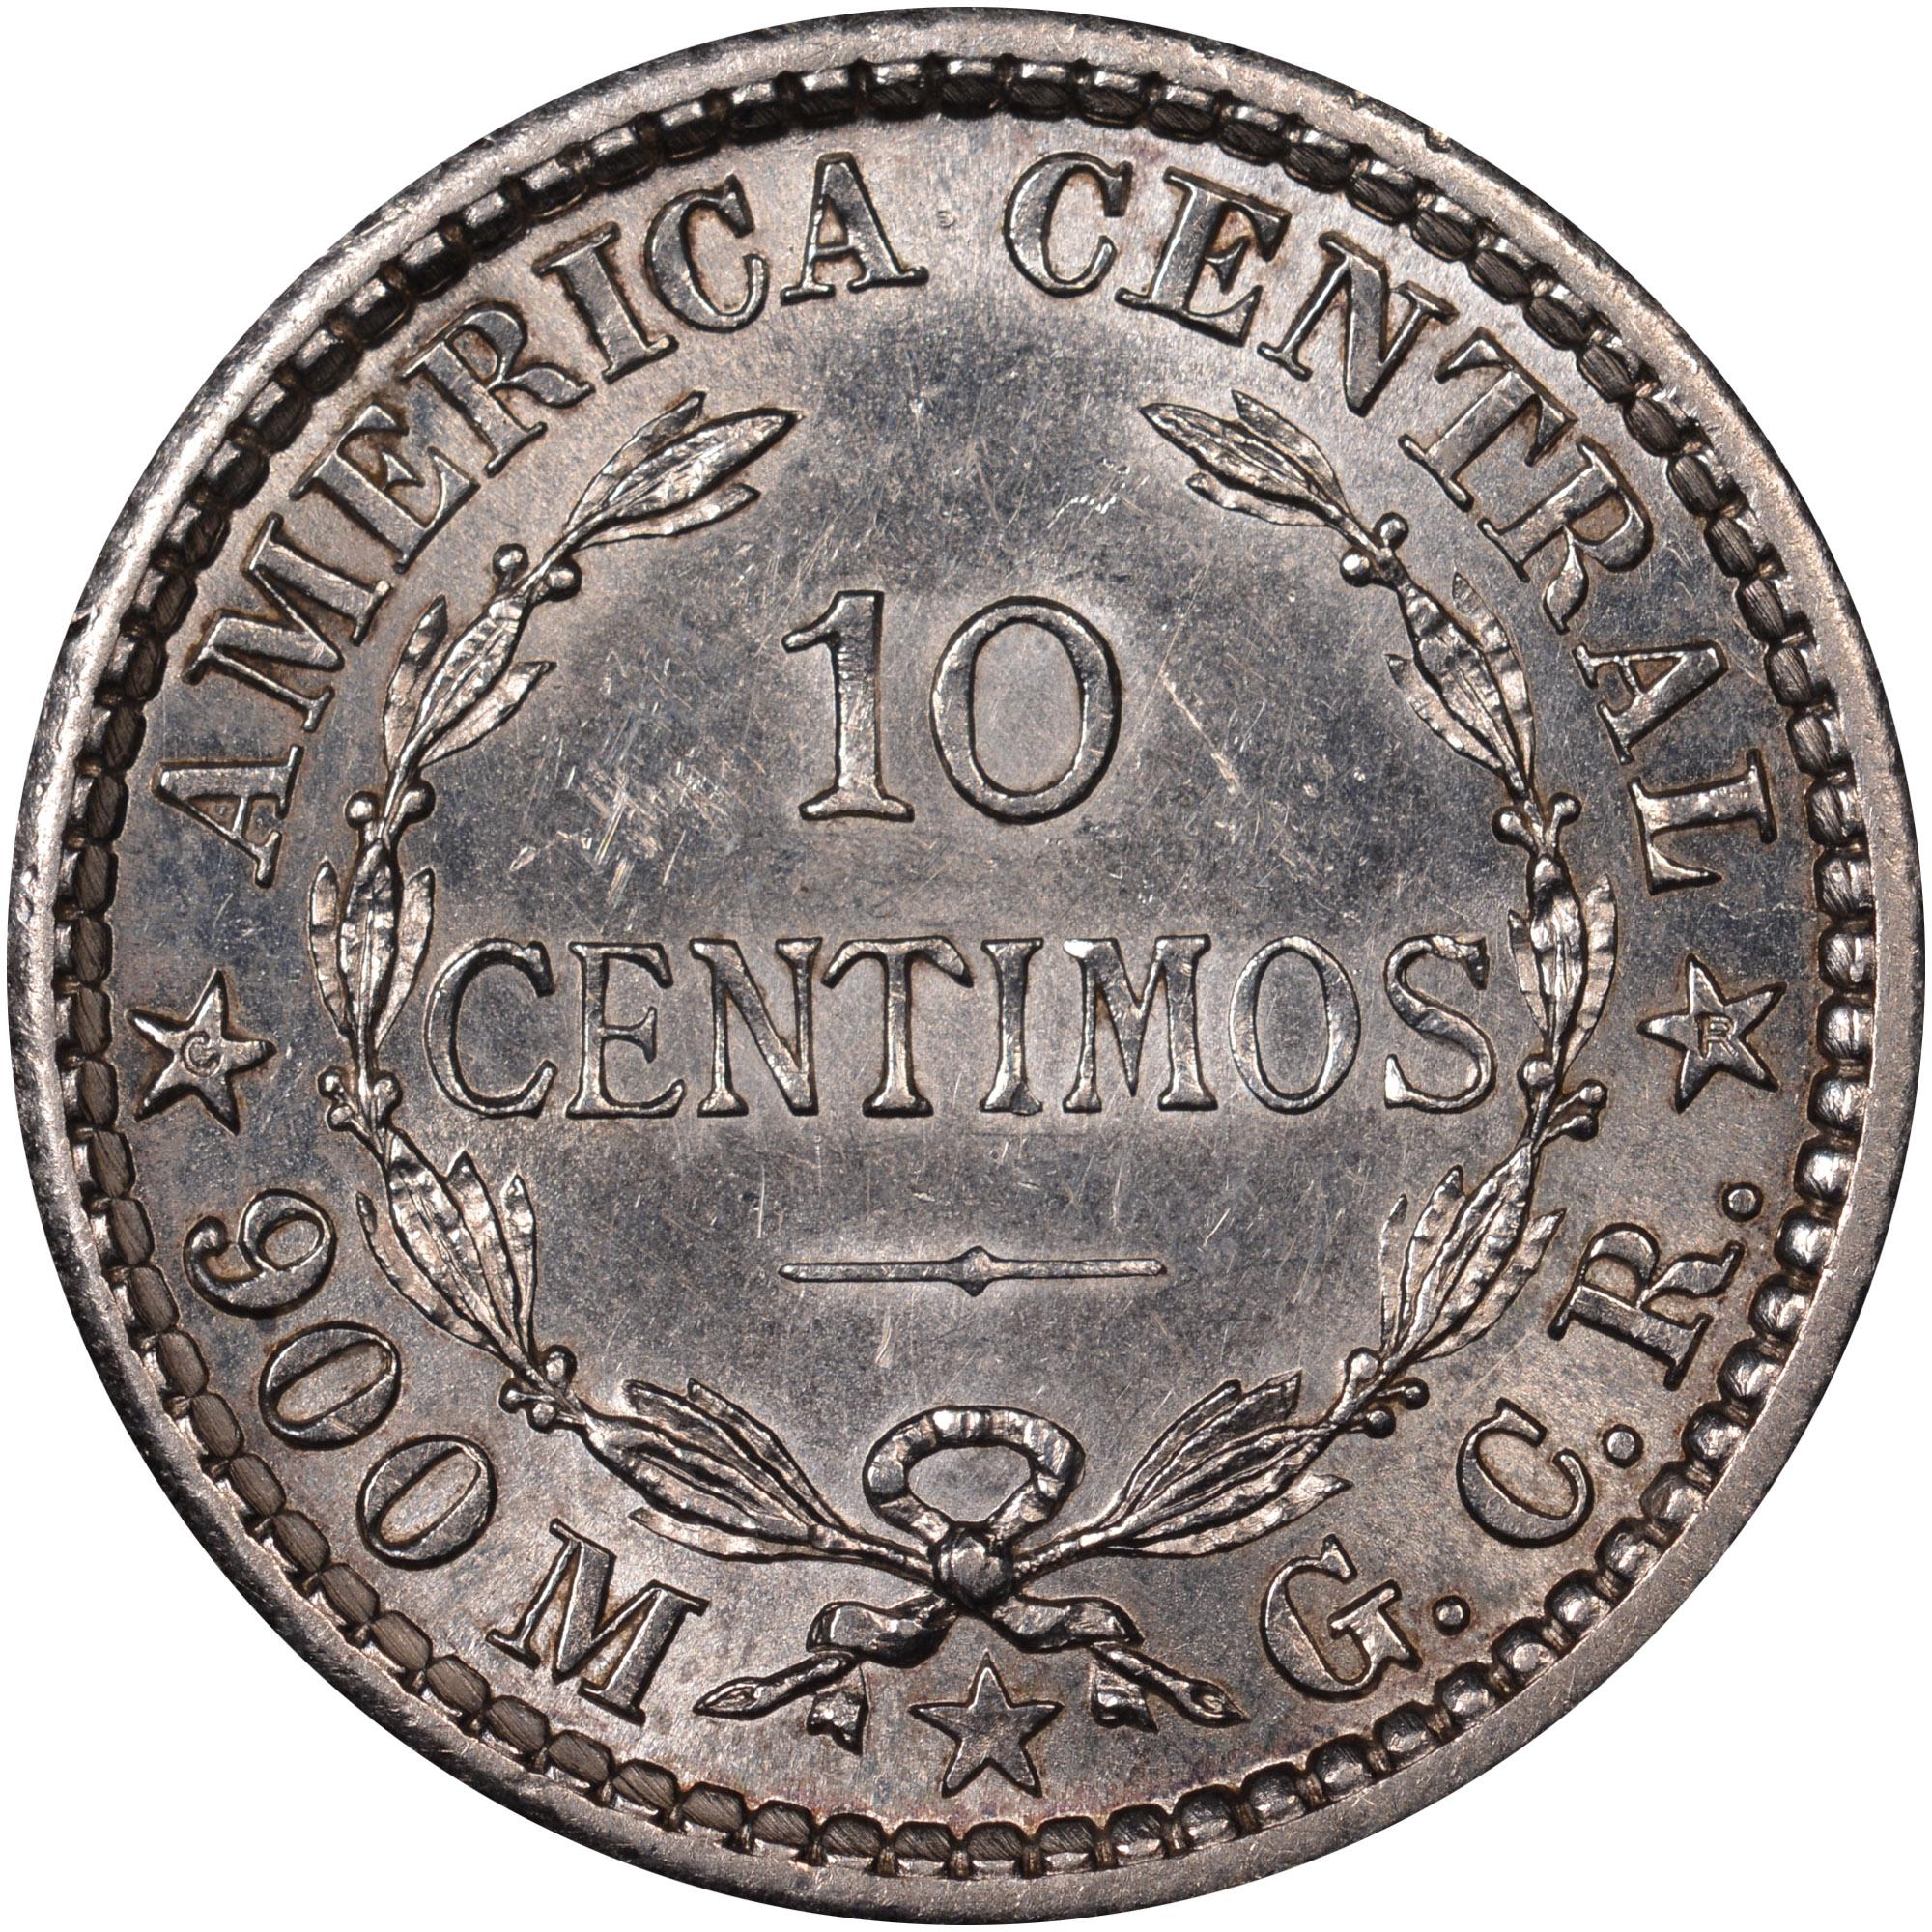 1905-1914 Costa Rica 10 Centimos reverse